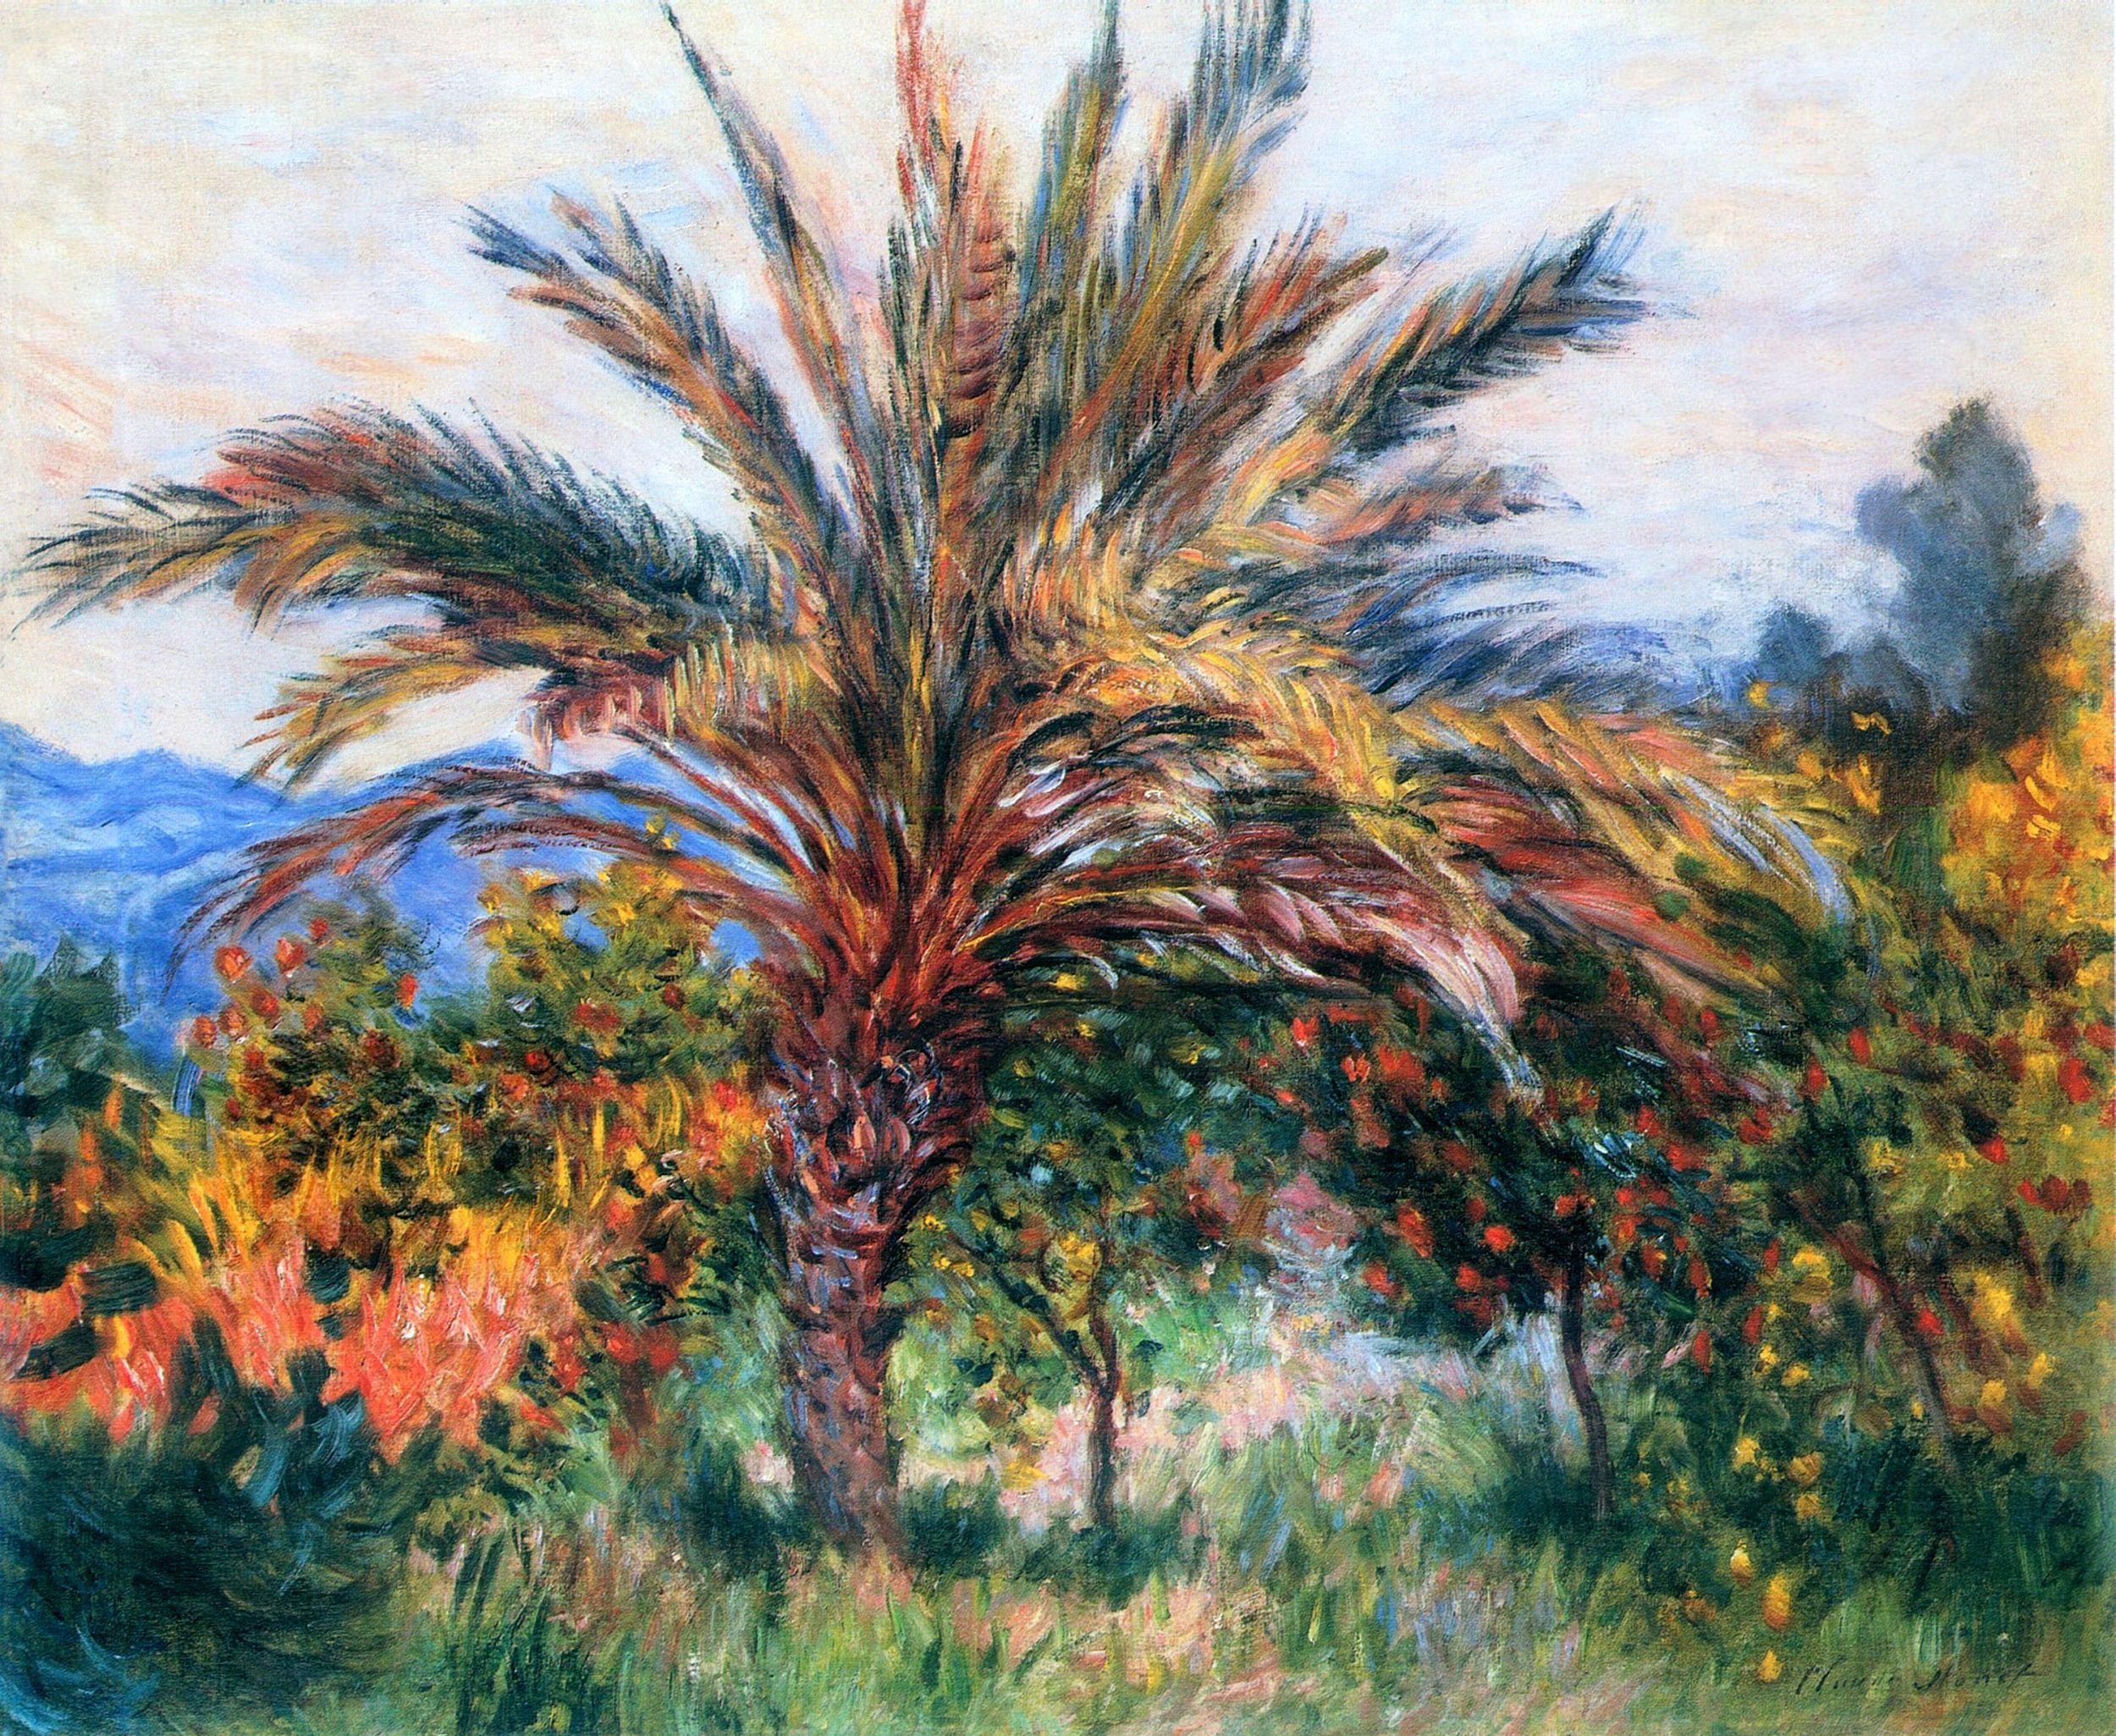 Palm Tree at Bordighera - Claude Monet | Monet art, Claude monet art,  Claude monet paintings